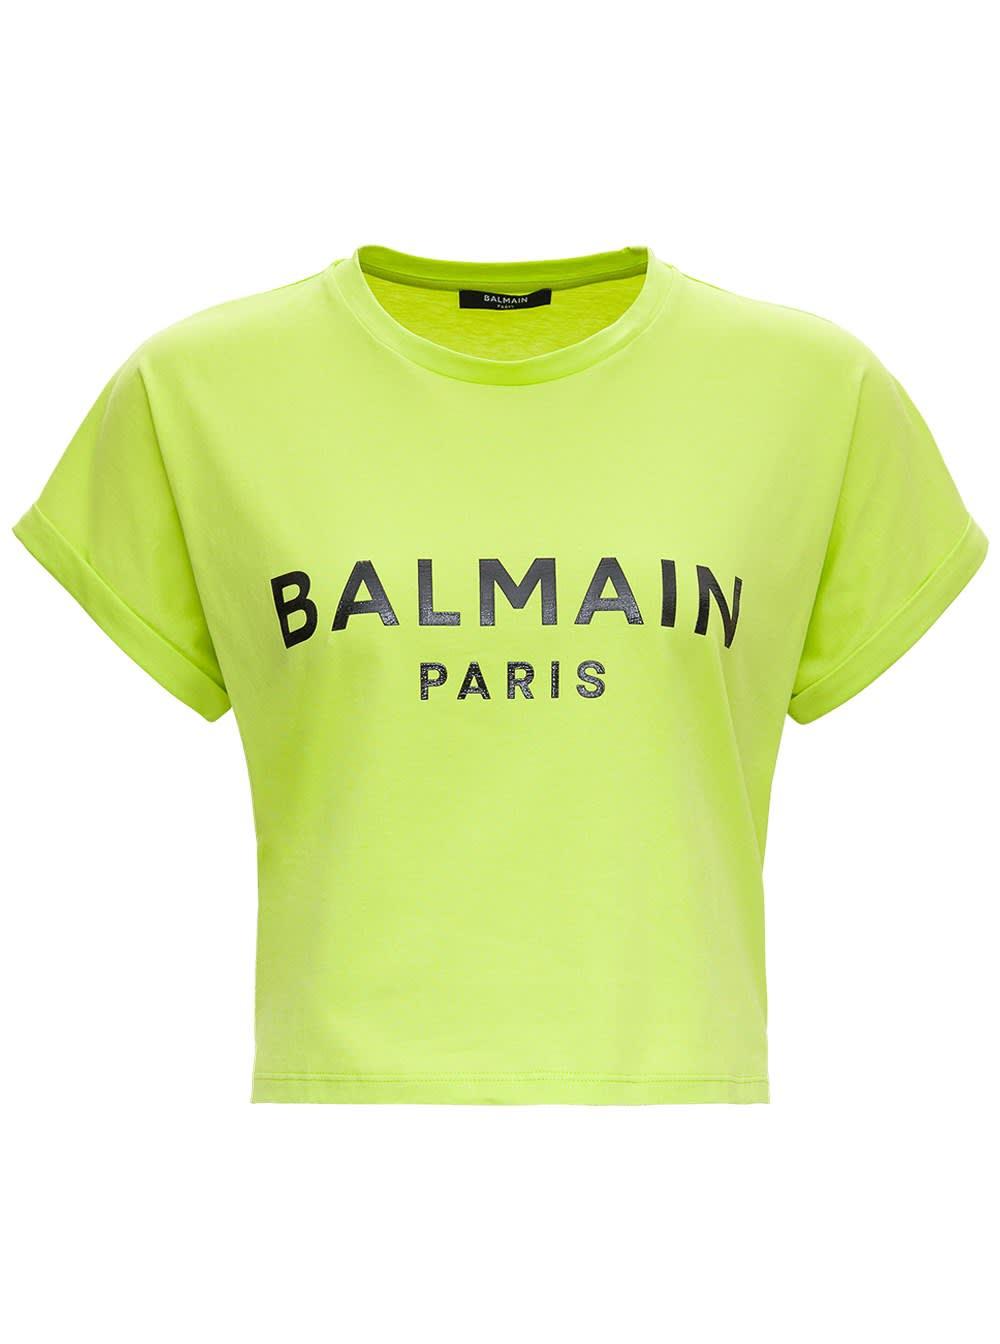 Balmain GREEN JERSEY CROP T-SHIRT WITH LOGO PRINT